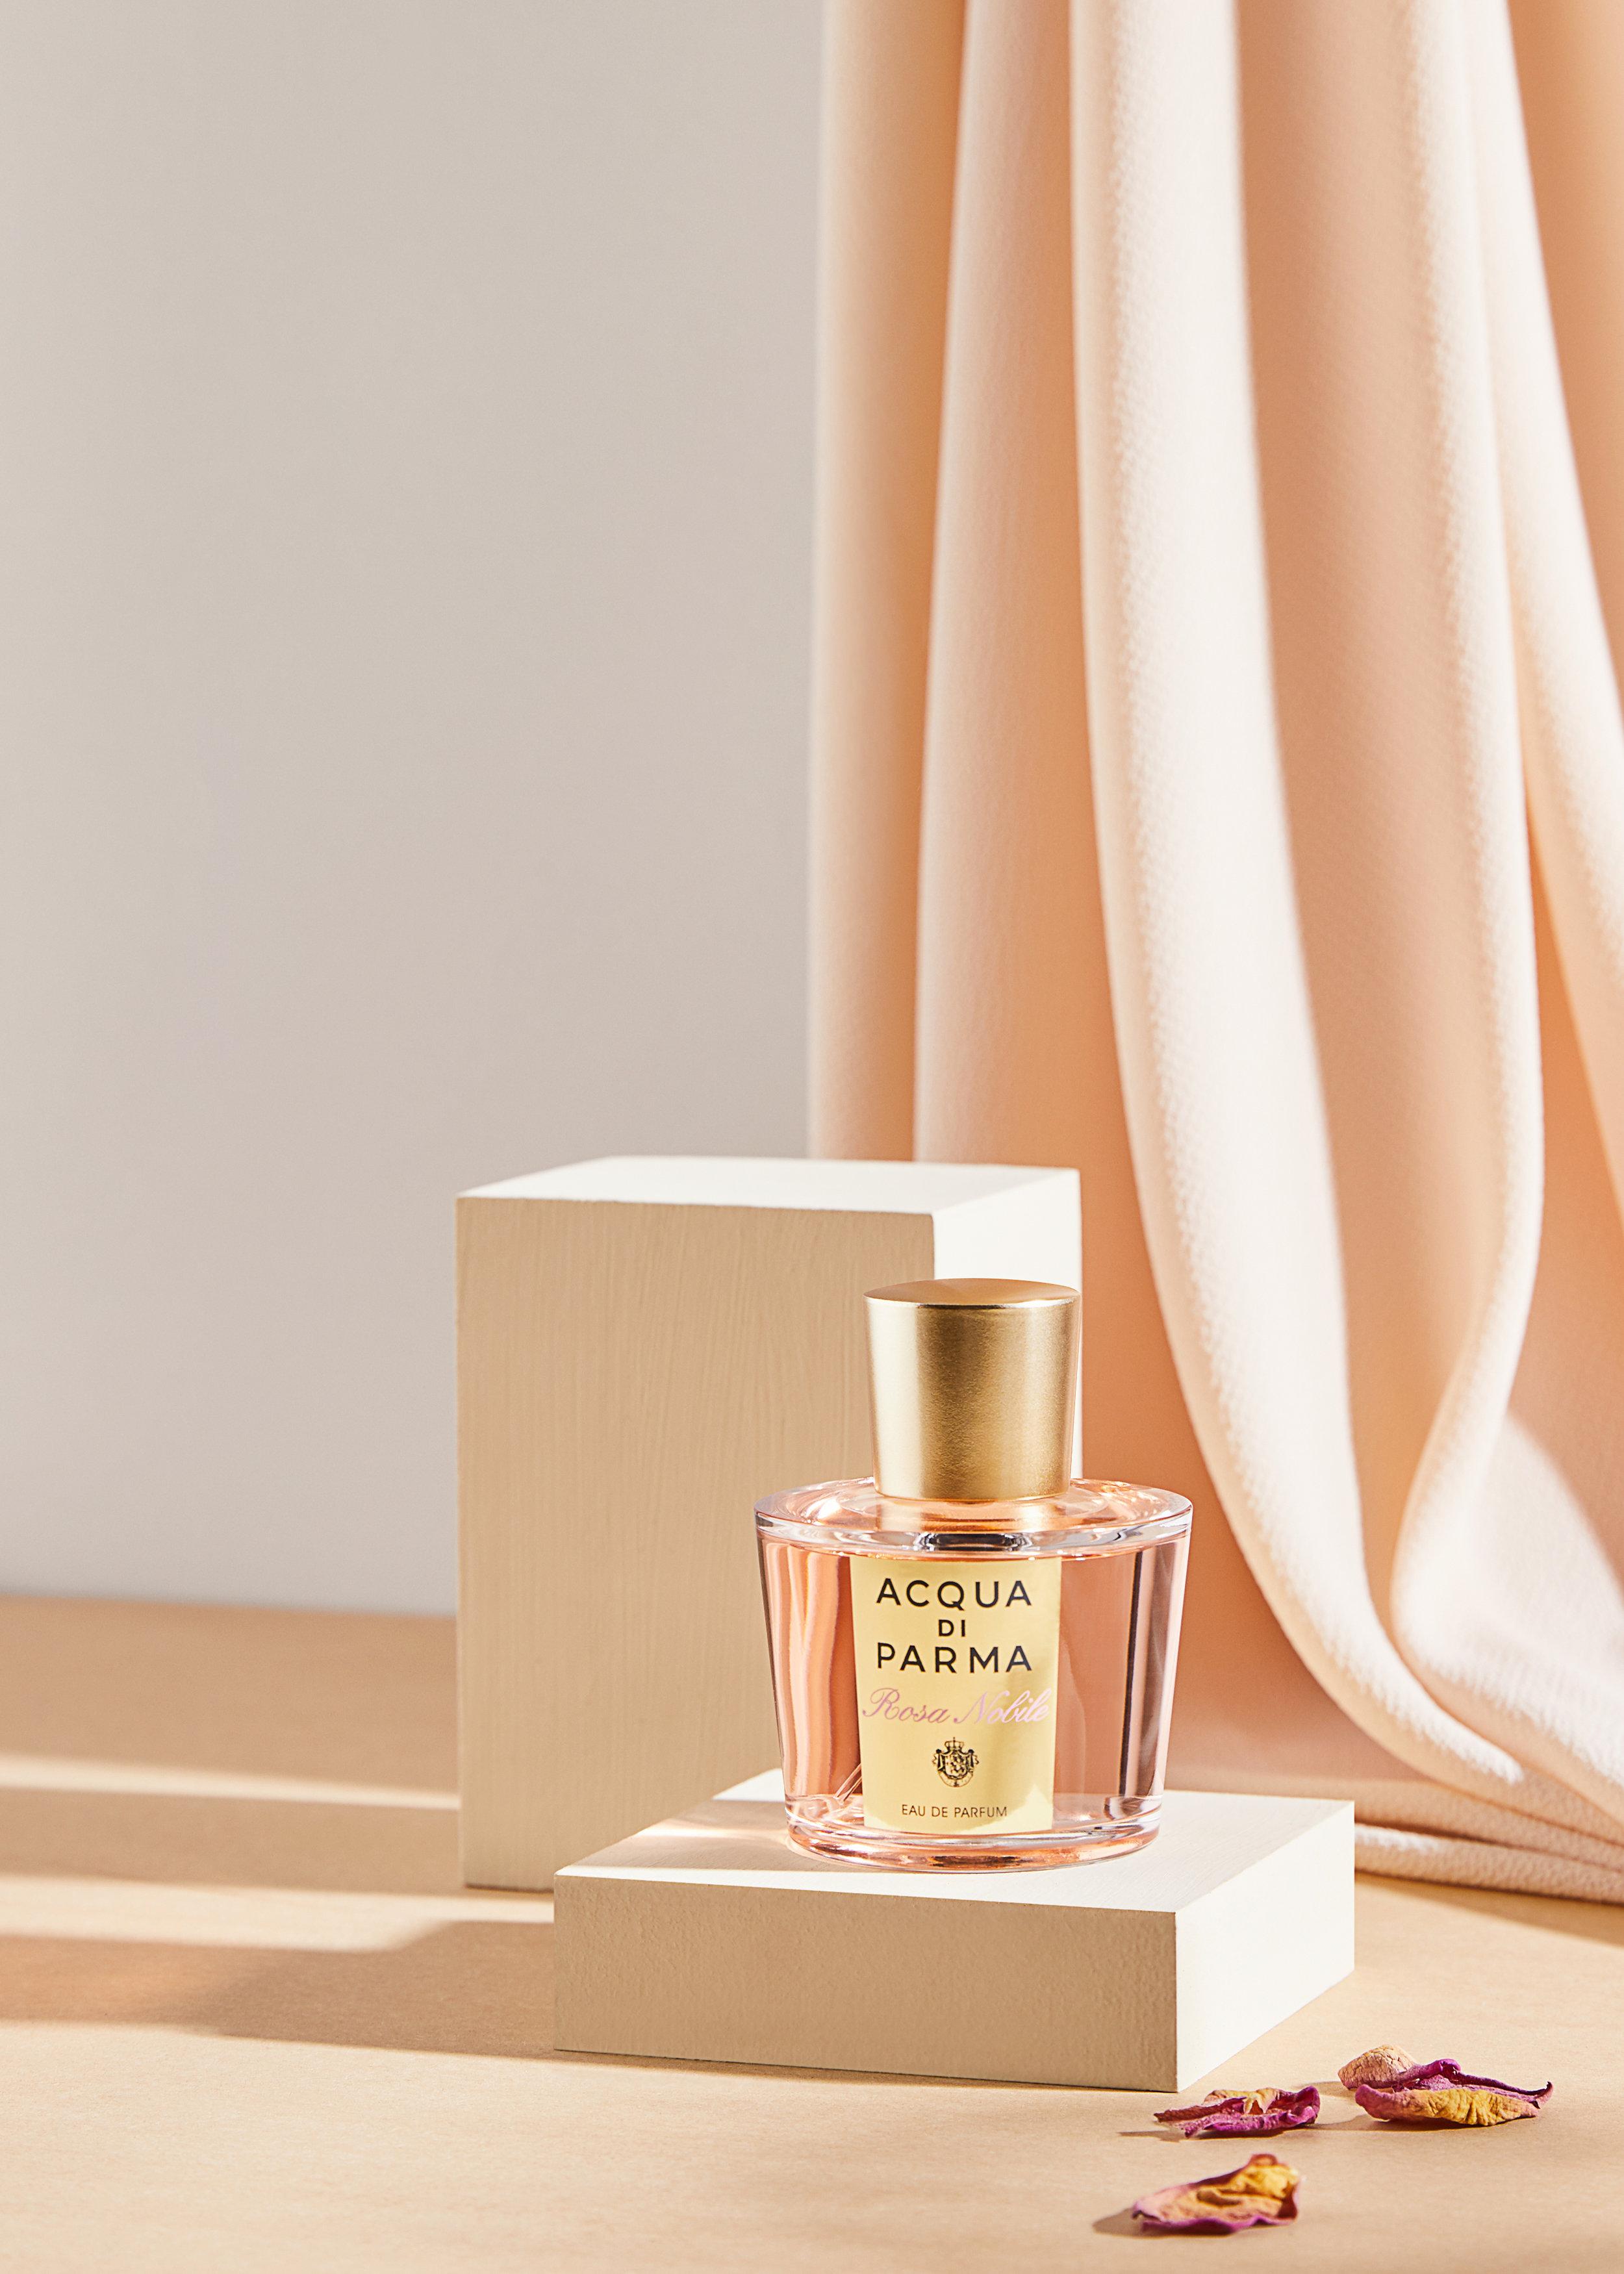 PerfumeSeries_TaraLiondaris 4 RT.jpg